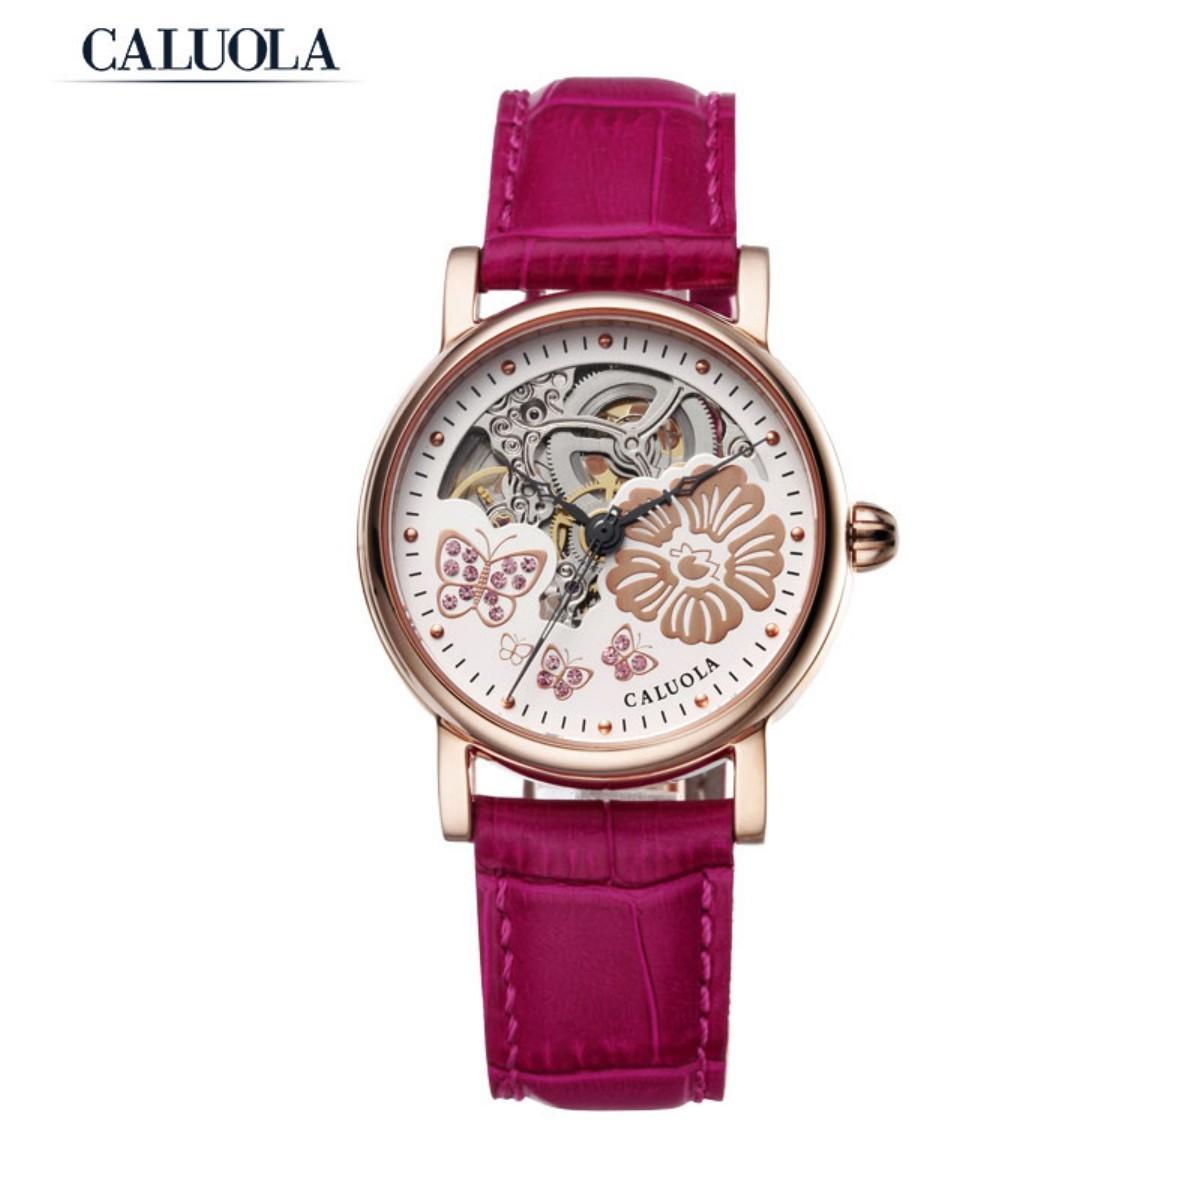 Caluola Women Watch Rose Gold 35mm CA1090M